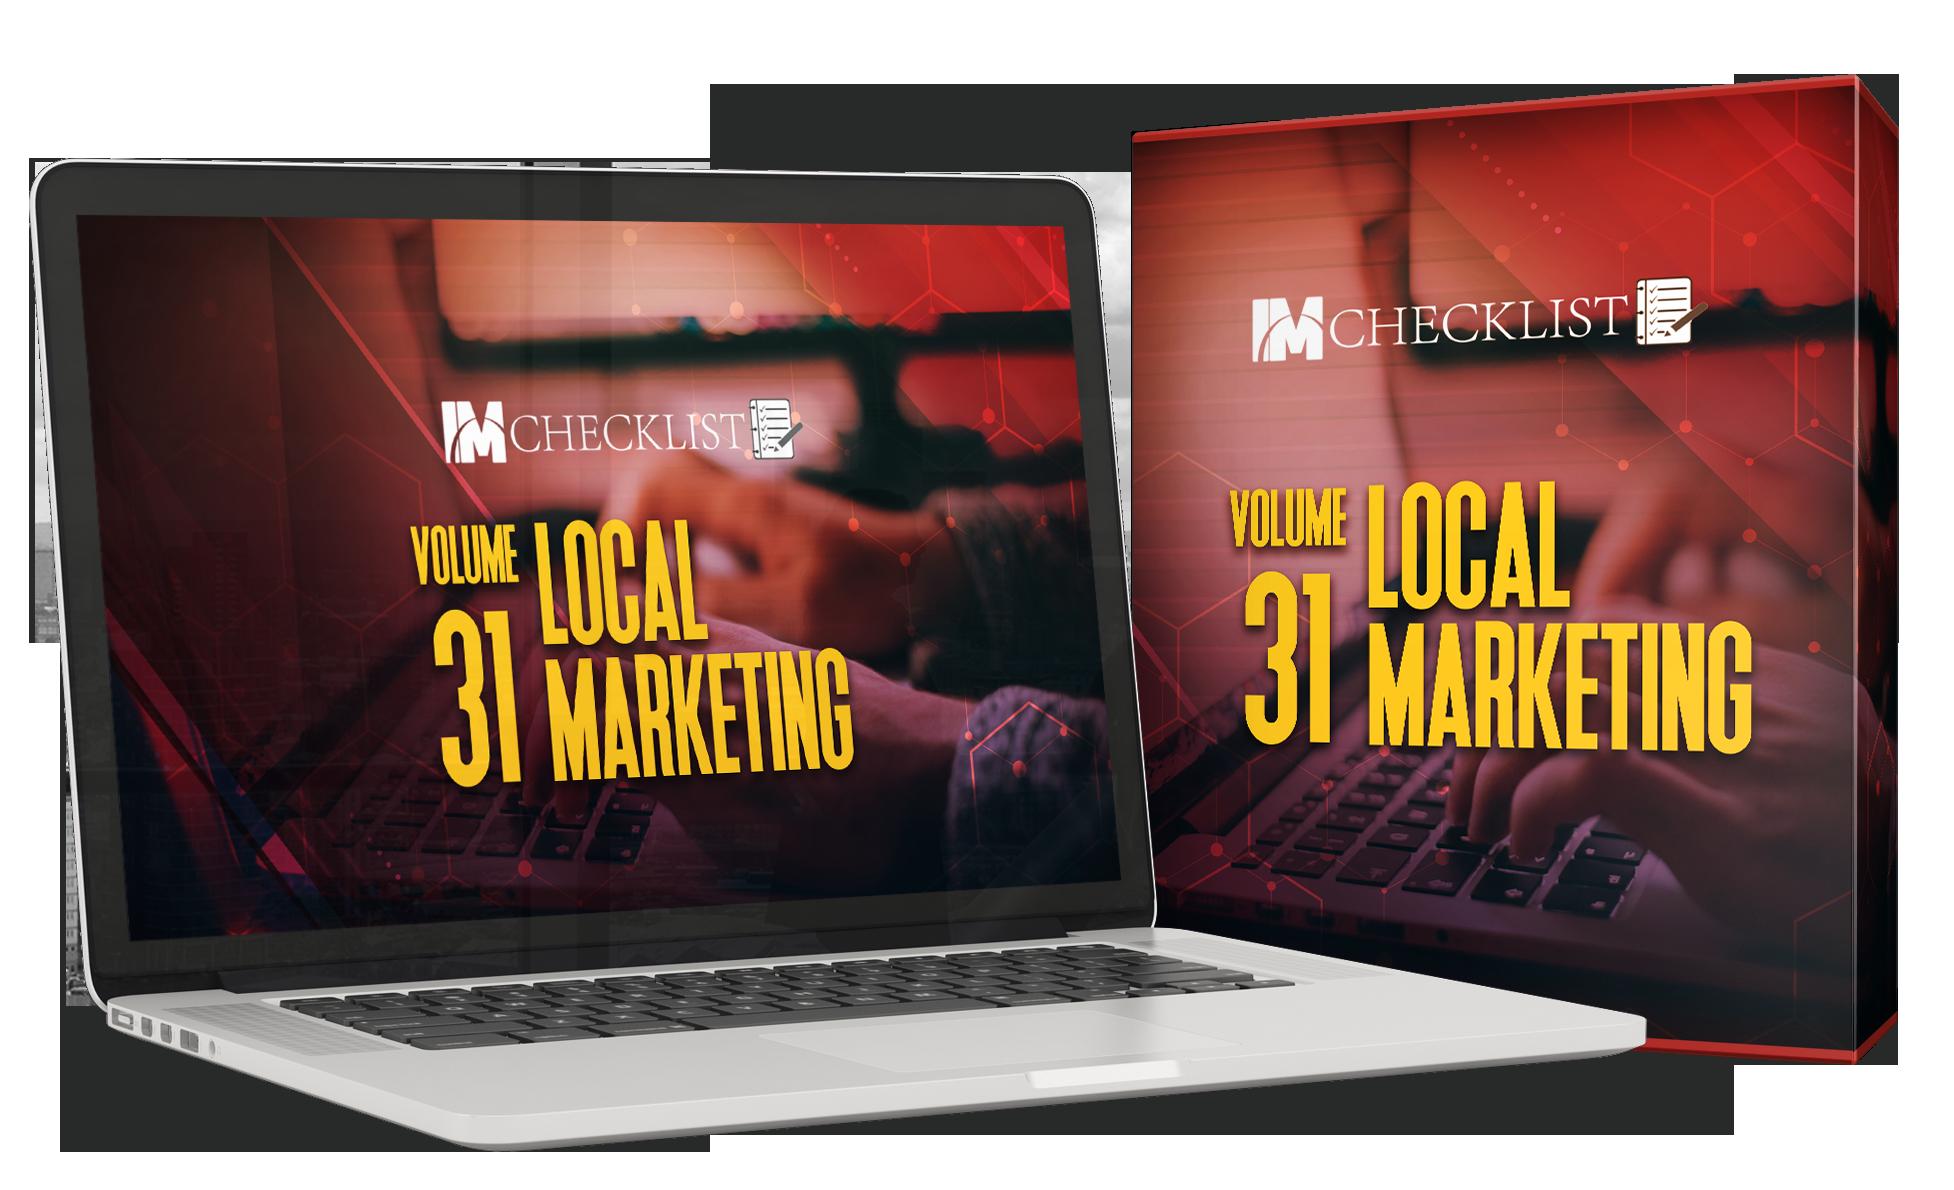 IM Checklist Local Marketing